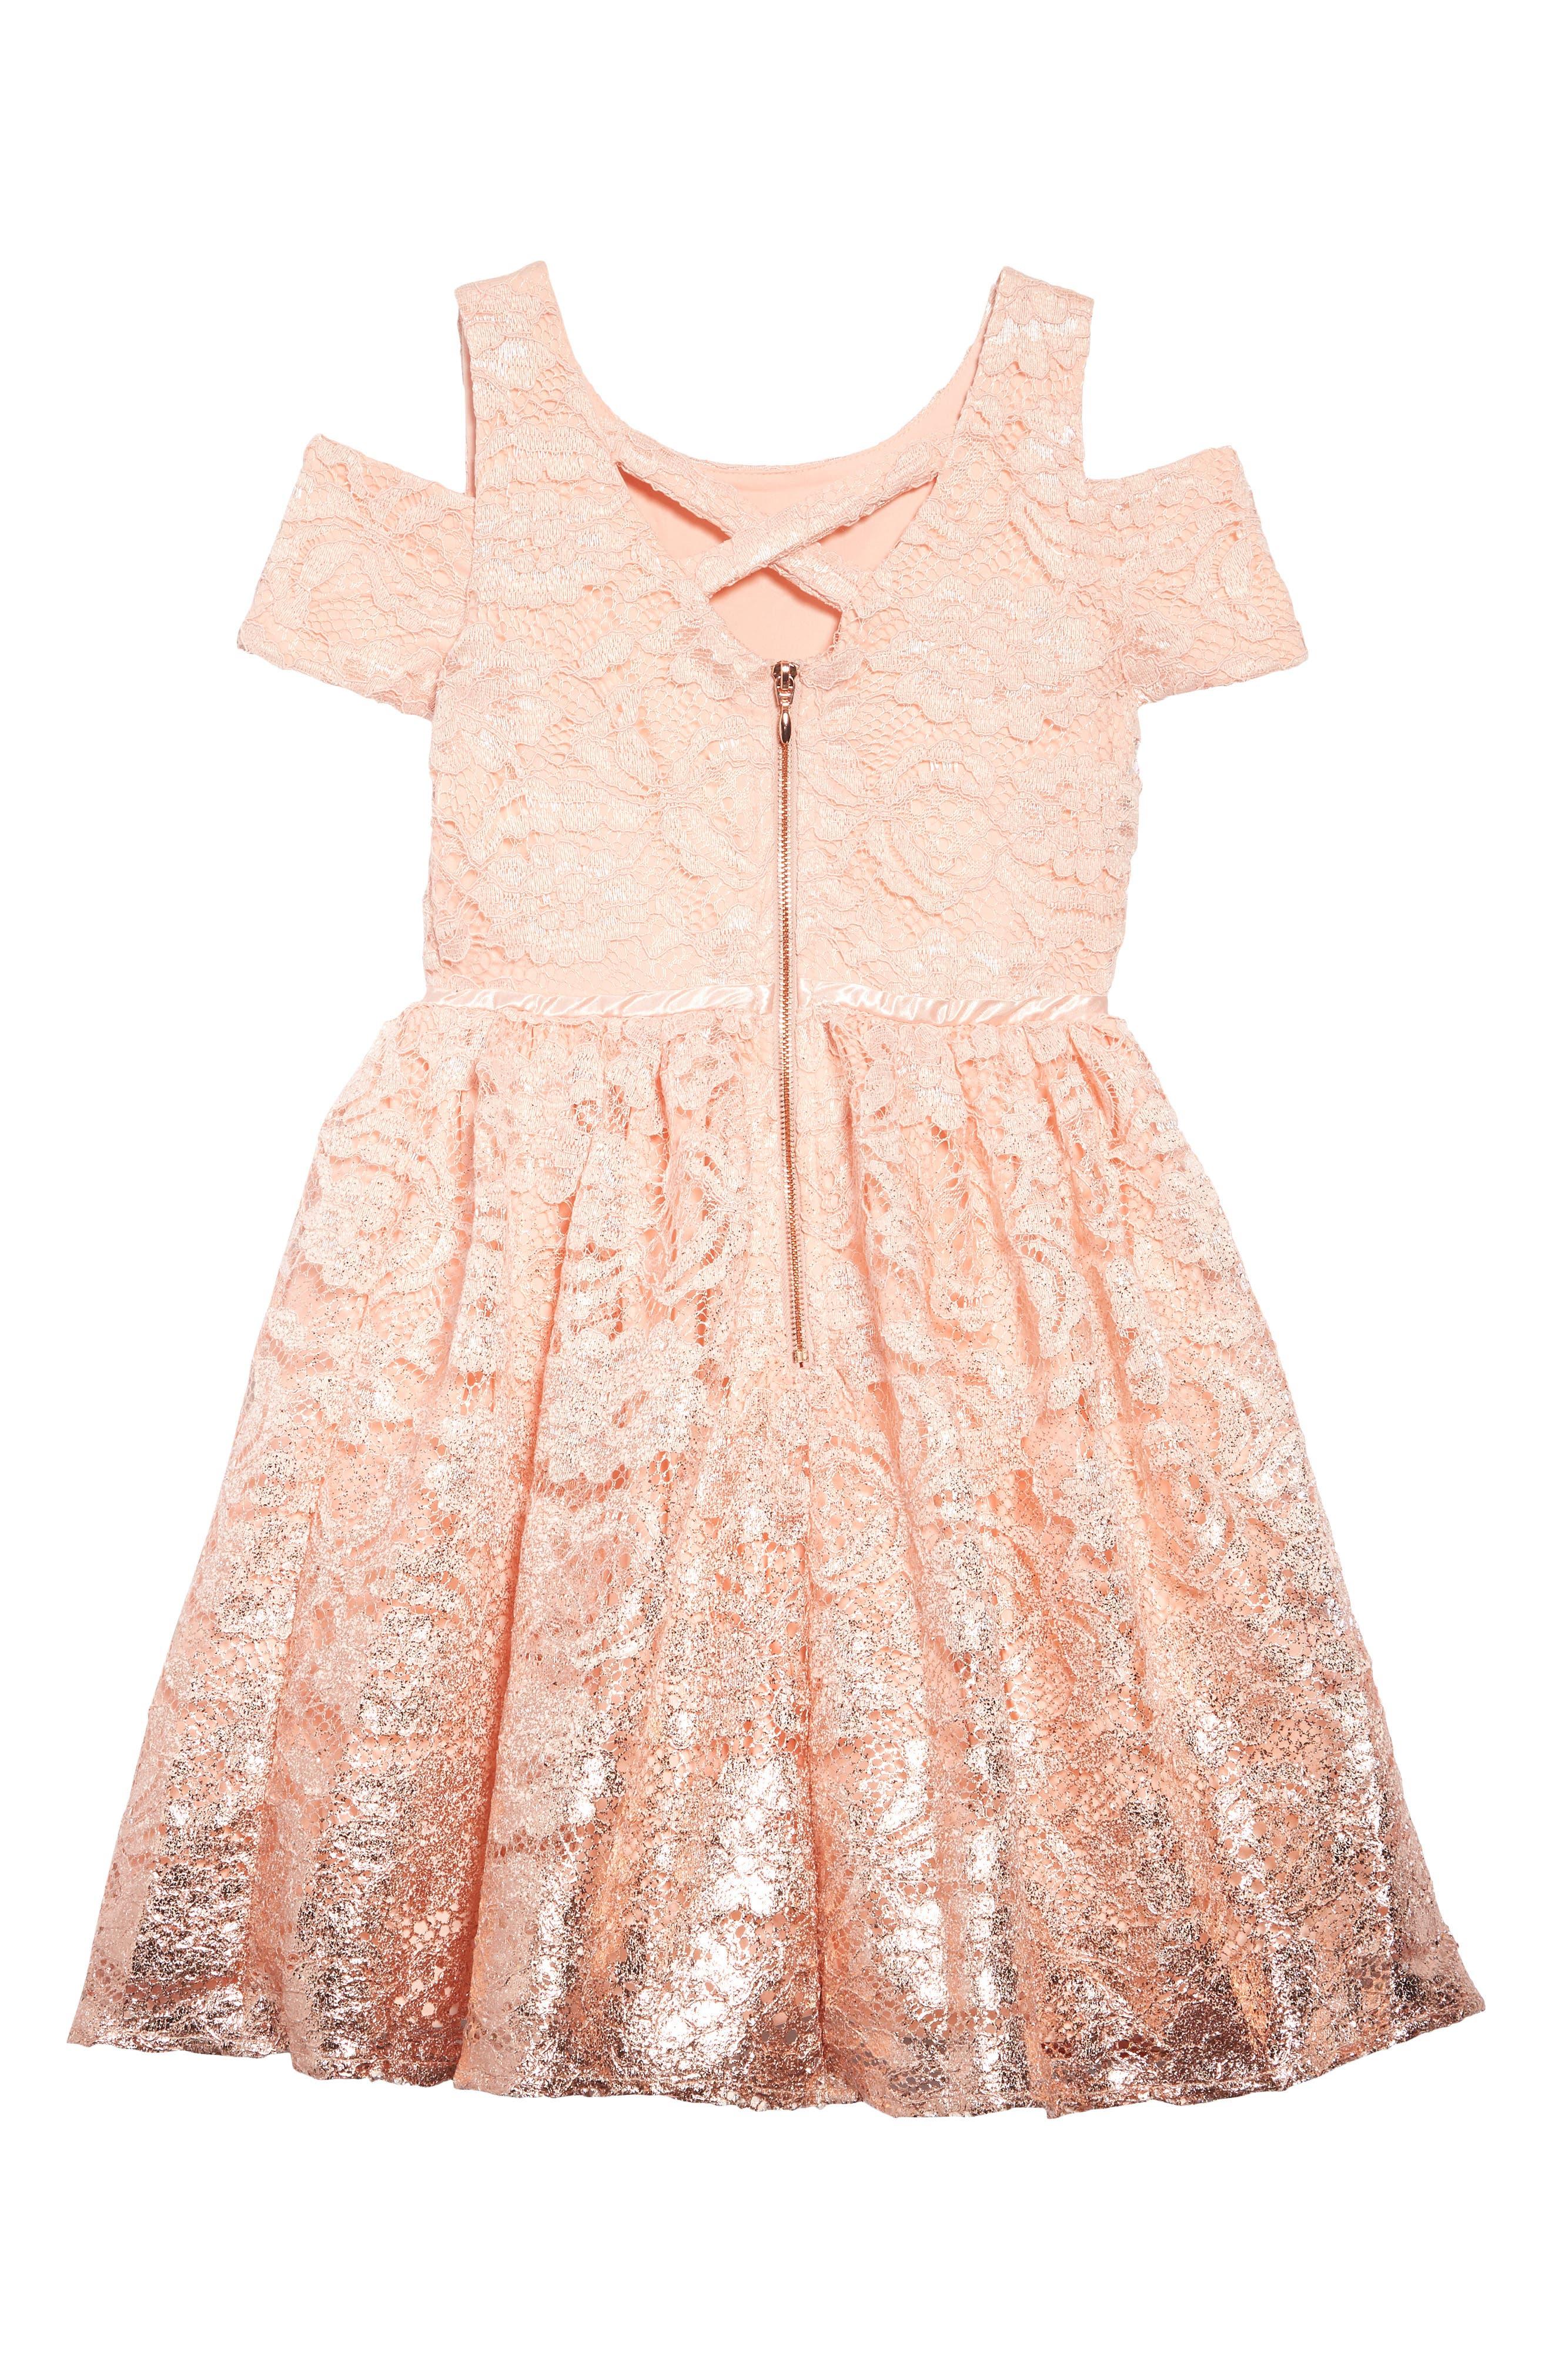 BLUSH BY US ANGELS, Foiled Lace Dress, Alternate thumbnail 2, color, BLUSH